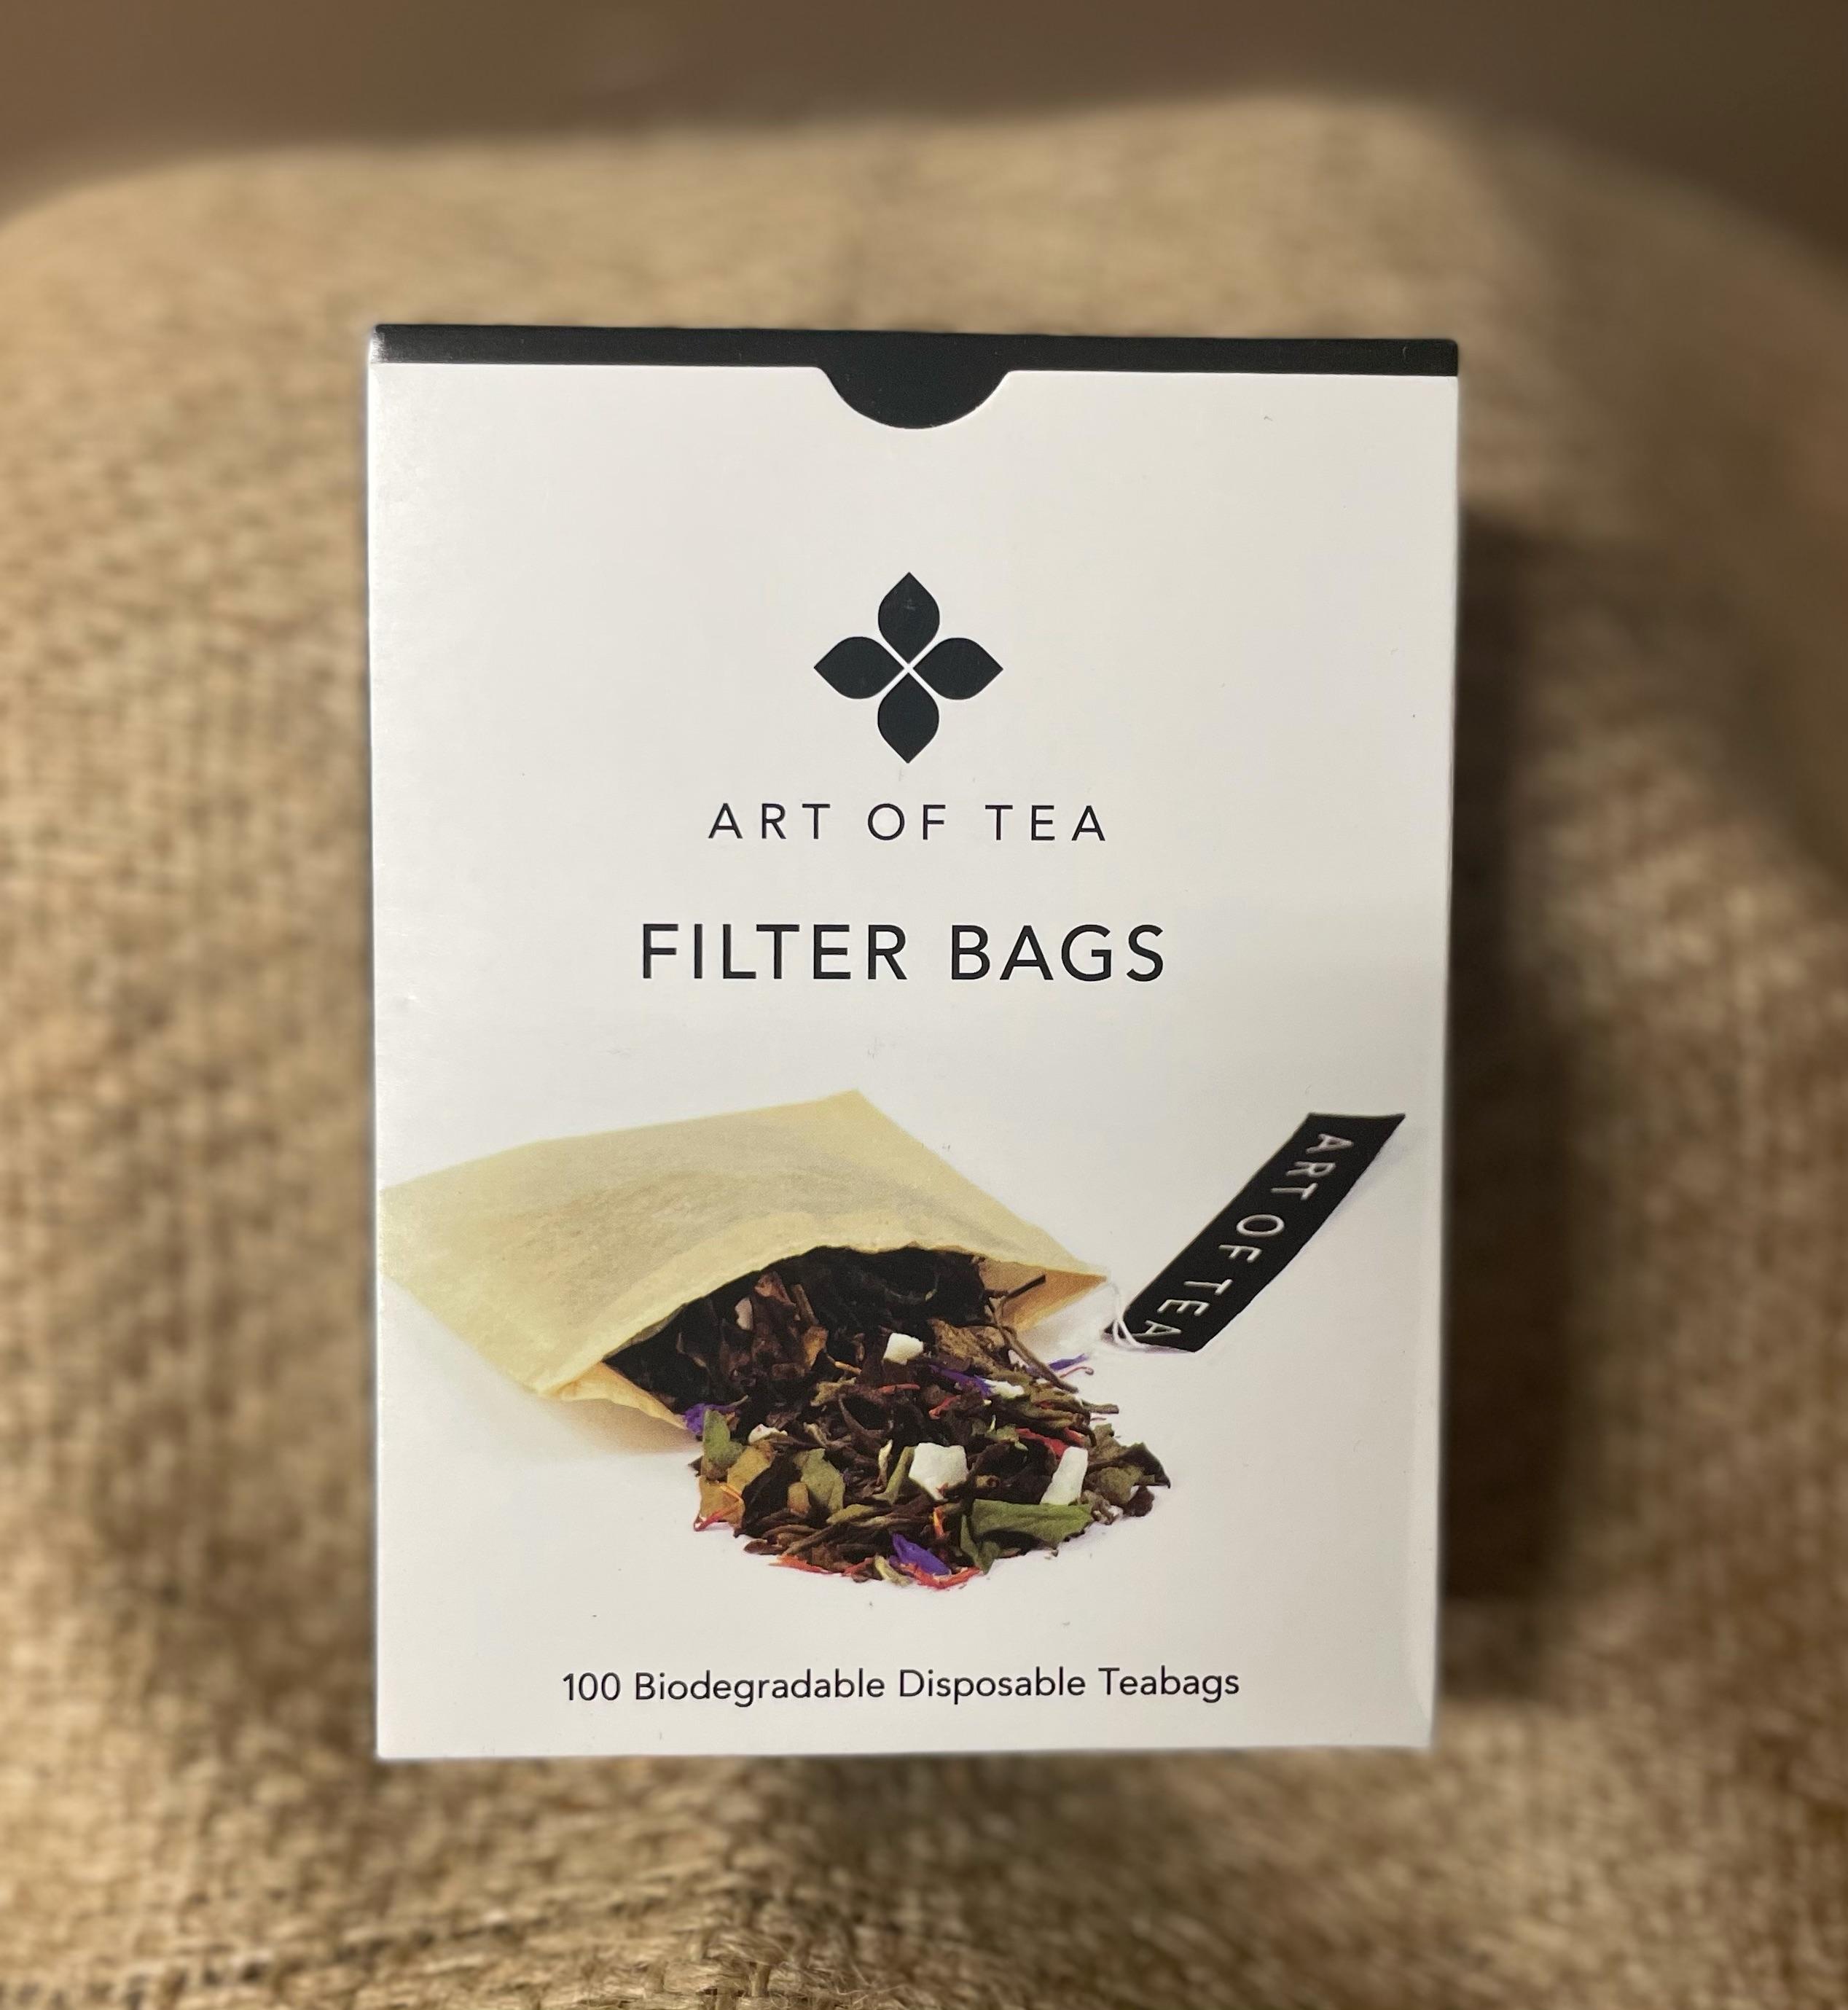 Biodegradable tea bags.  Box of 100